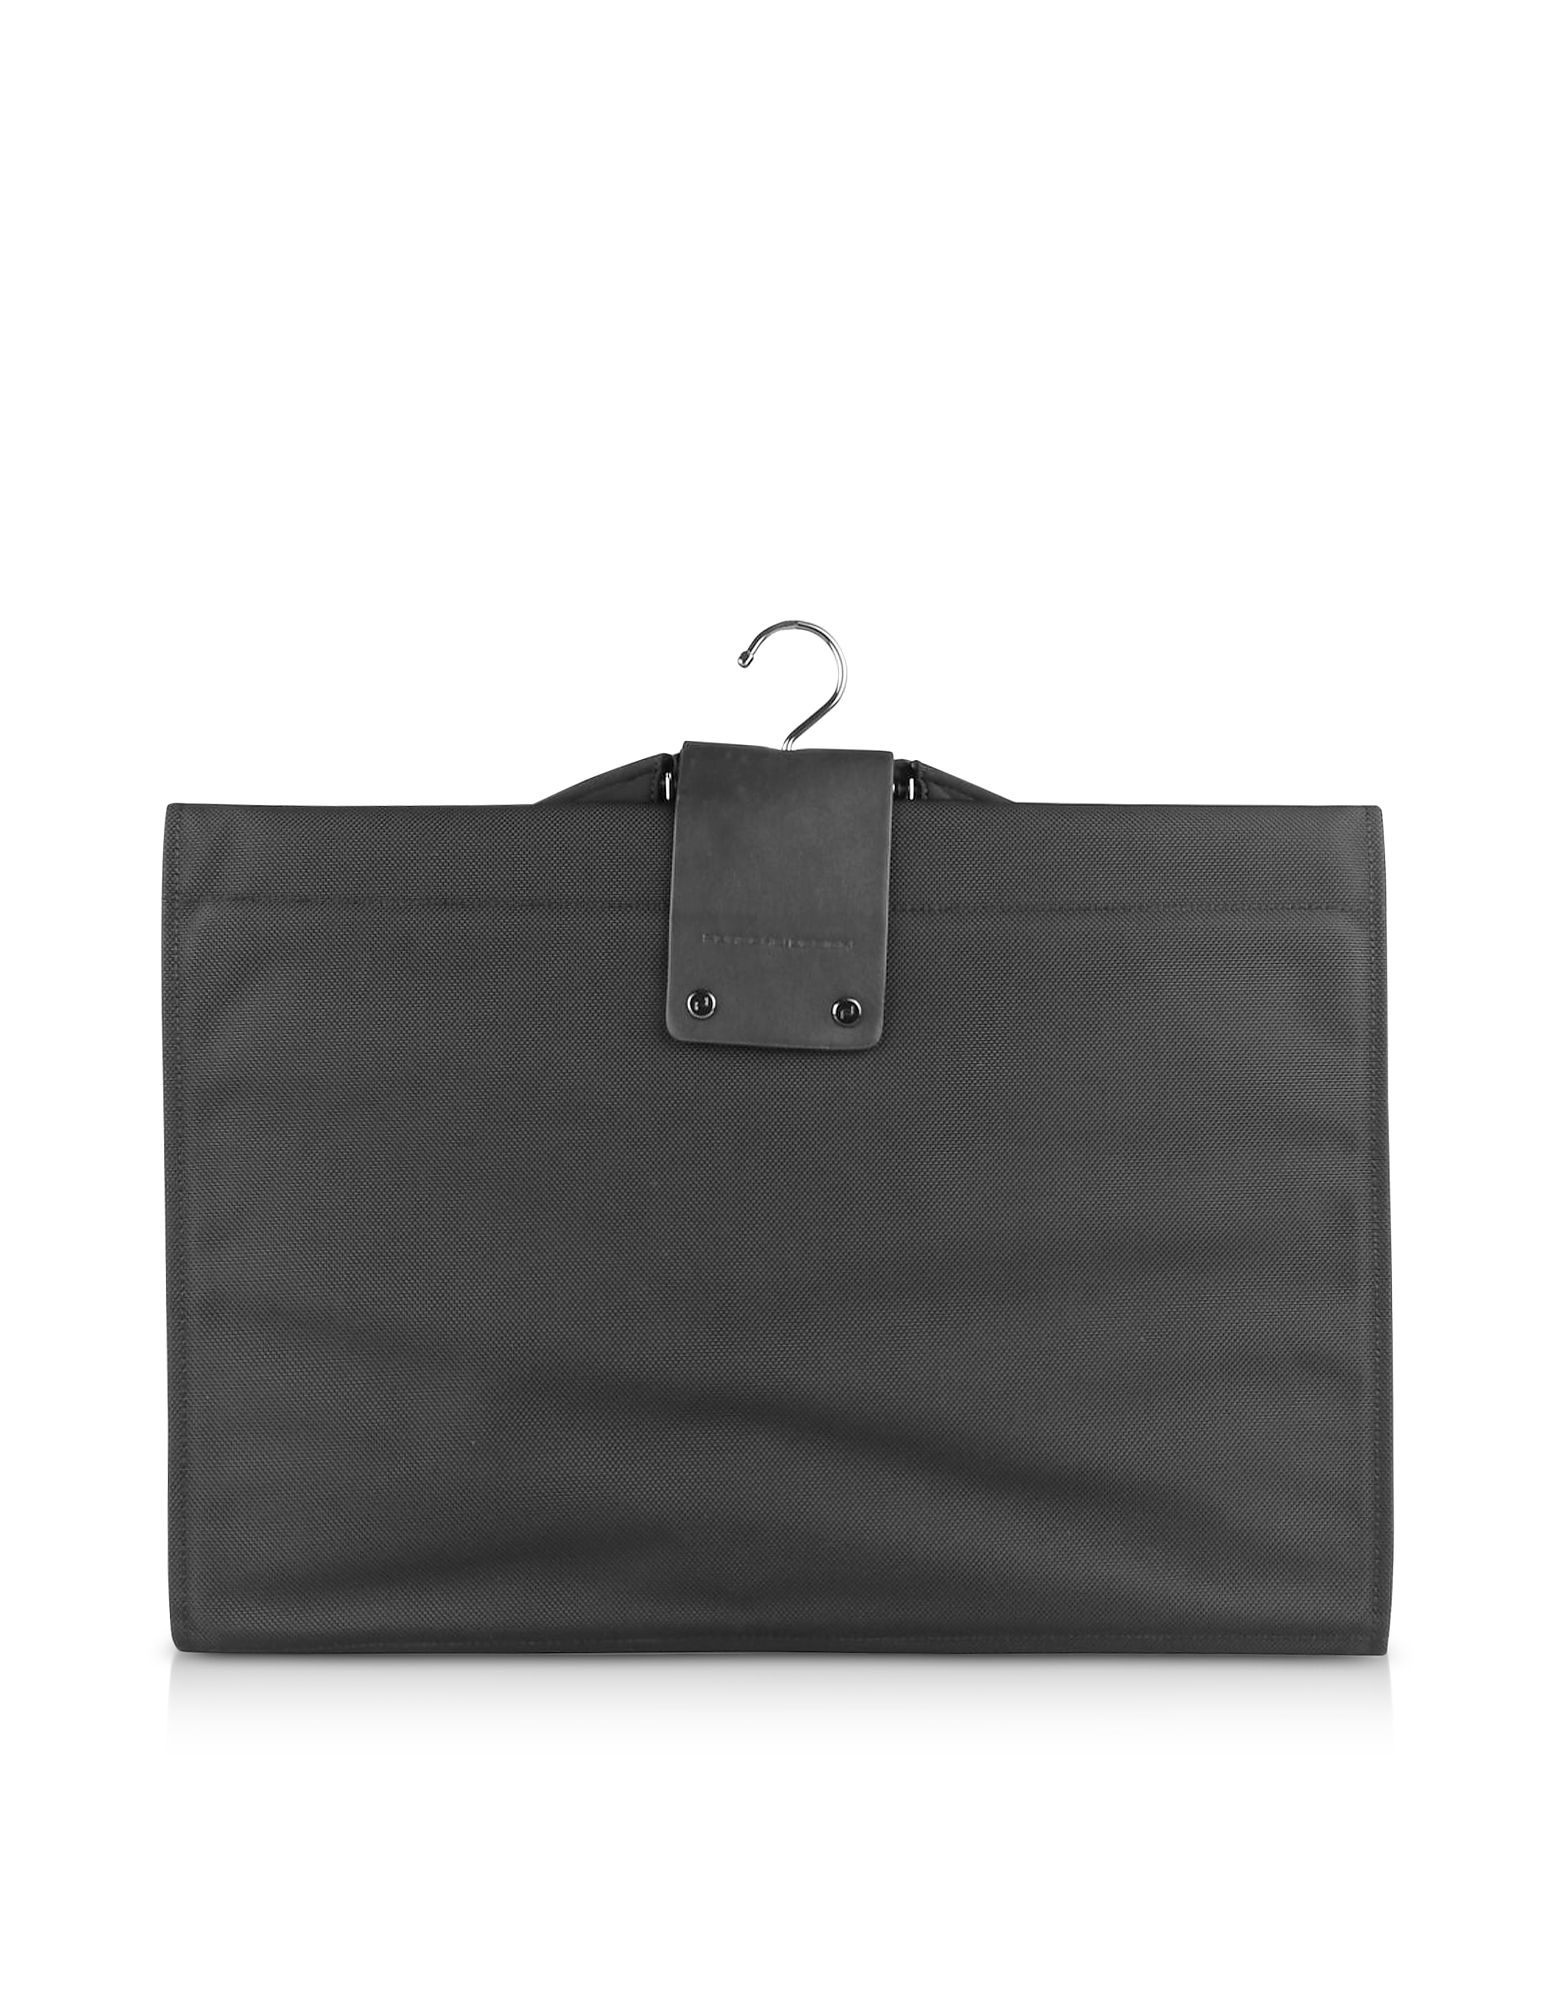 Roadster 4.0 Svz Foldable Garment Bag, Black